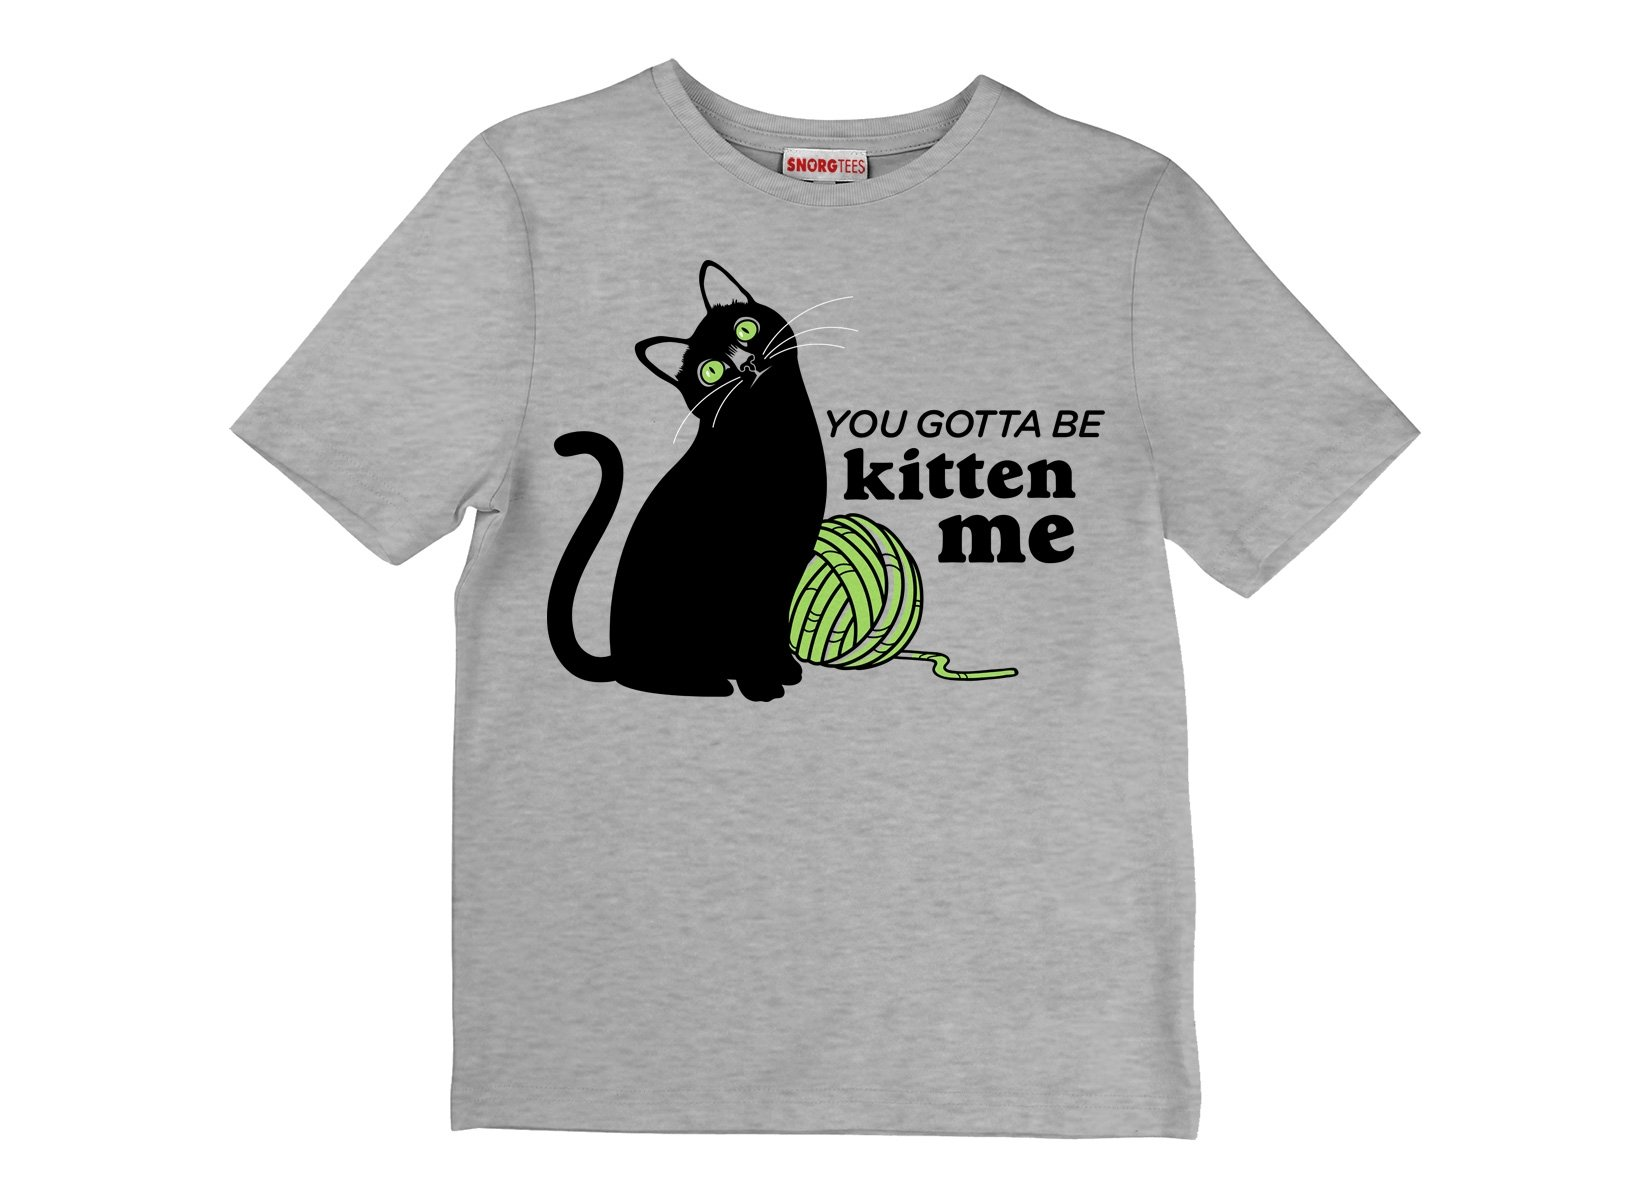 You Gotta Be Kitten Me on Kids T-Shirt